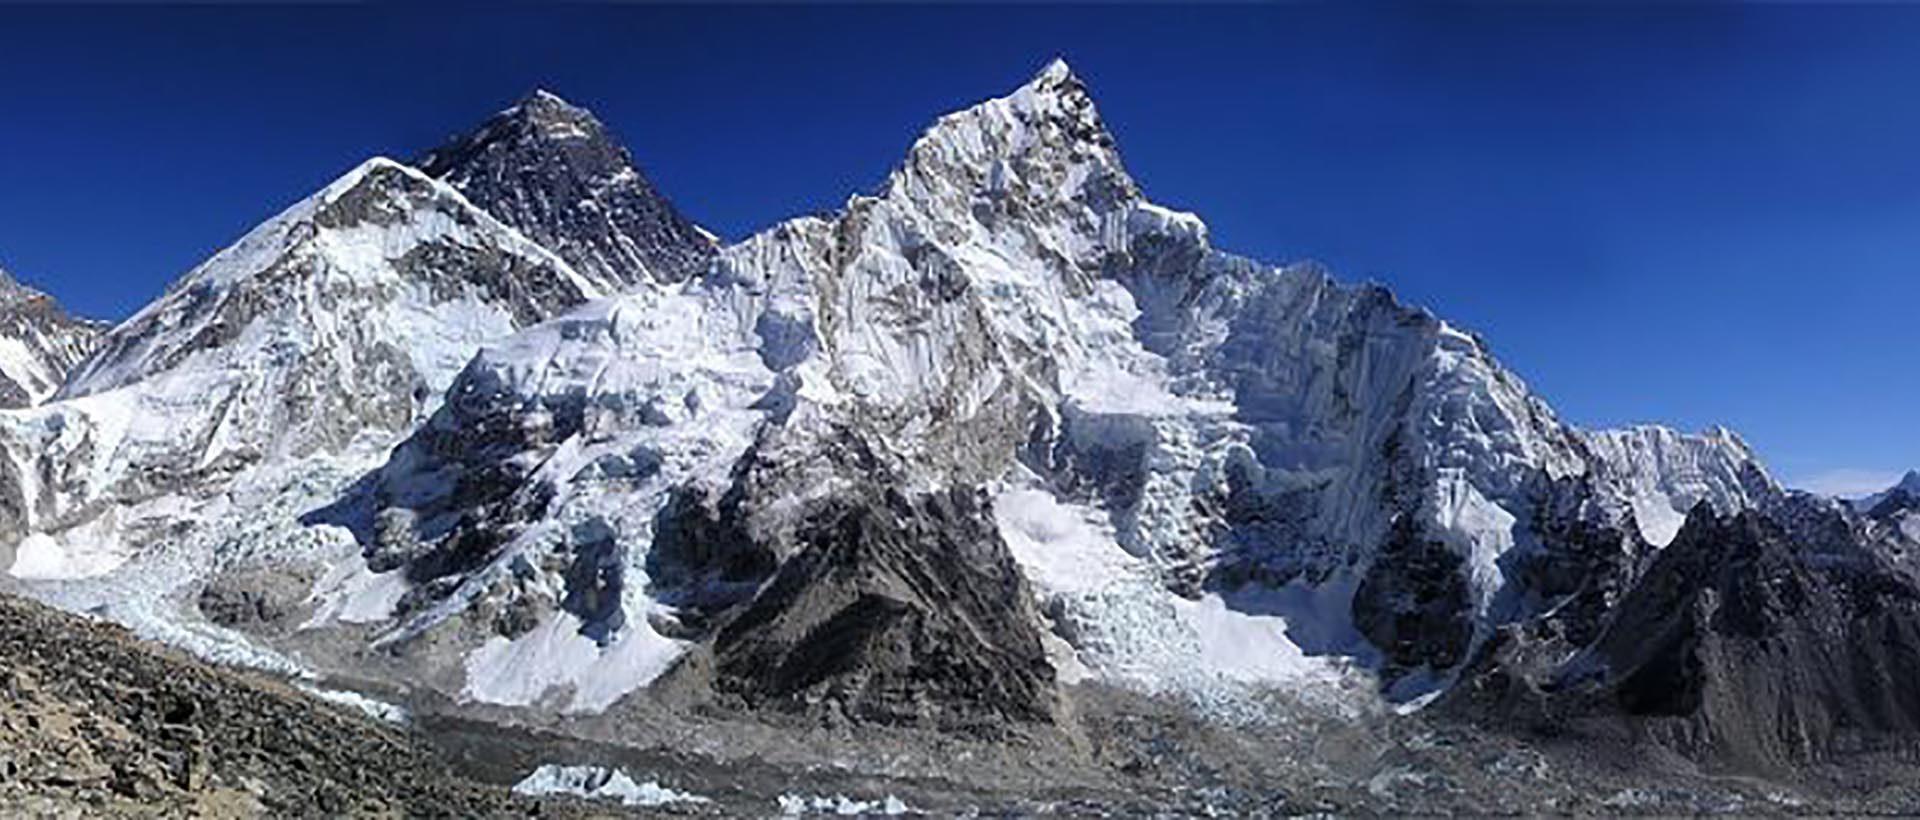 Nepal Trek 2022